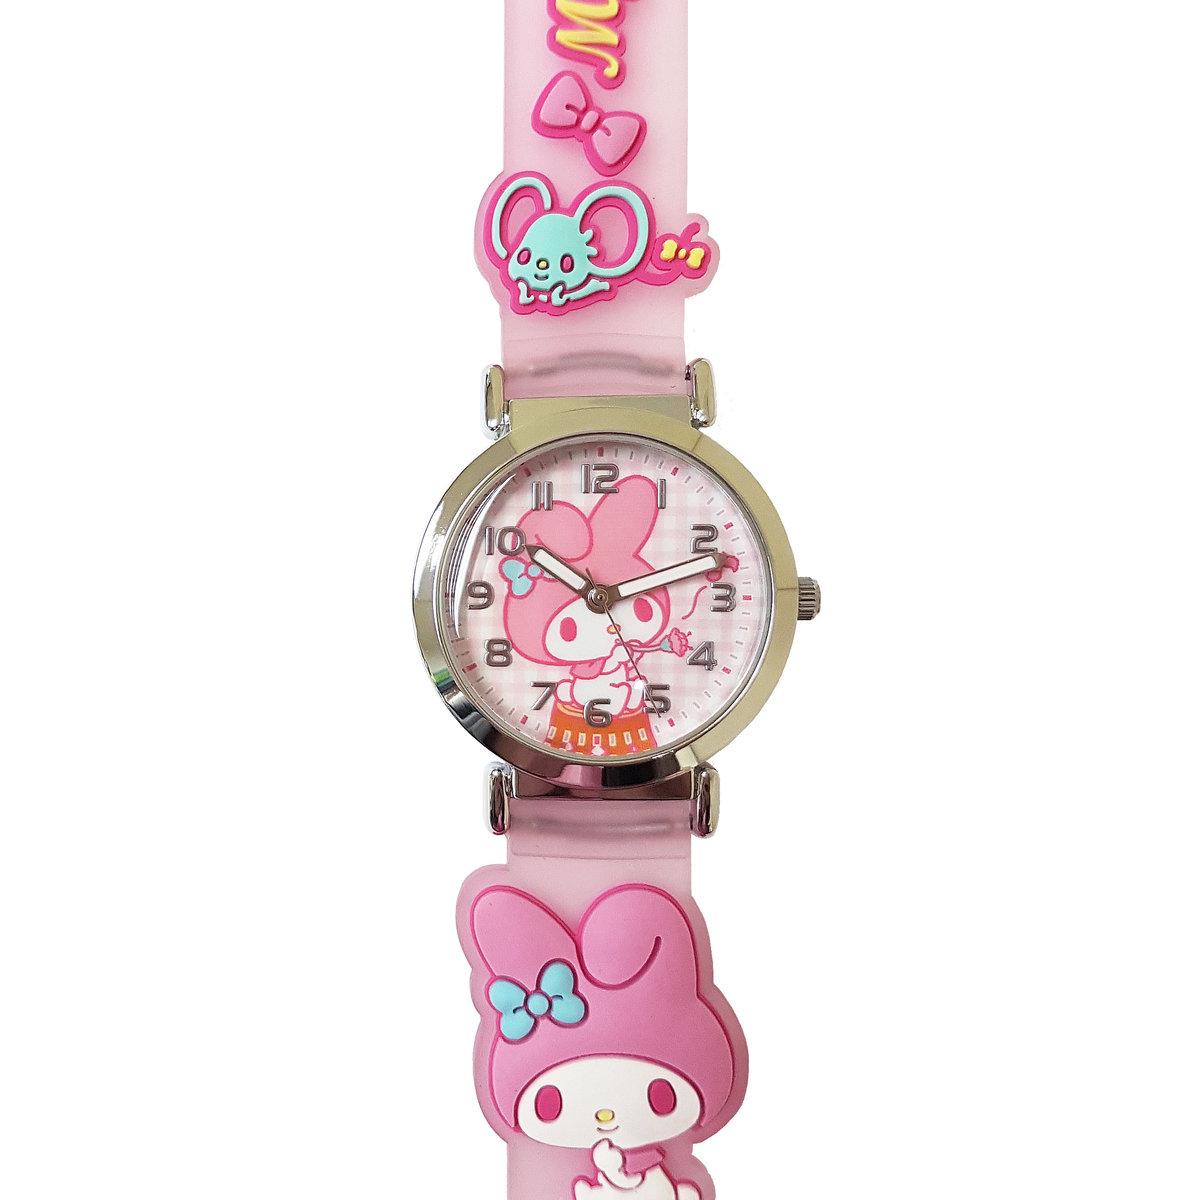 SANRIO - My Melody 2D band quartz watch (Pink)